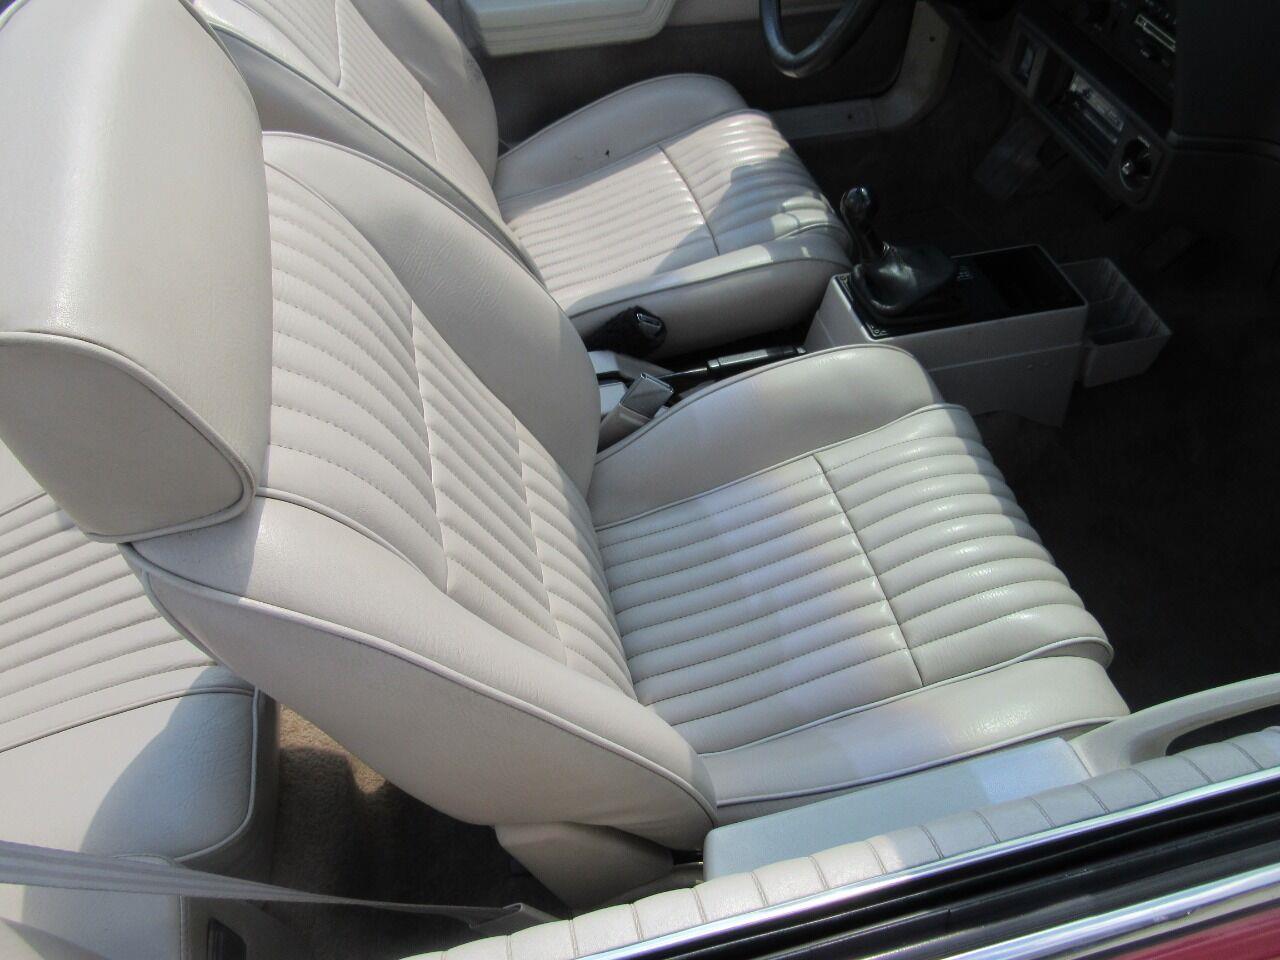 1984 Chevrolet Cavalier (CC-1382202) for sale in Ashland, Ohio